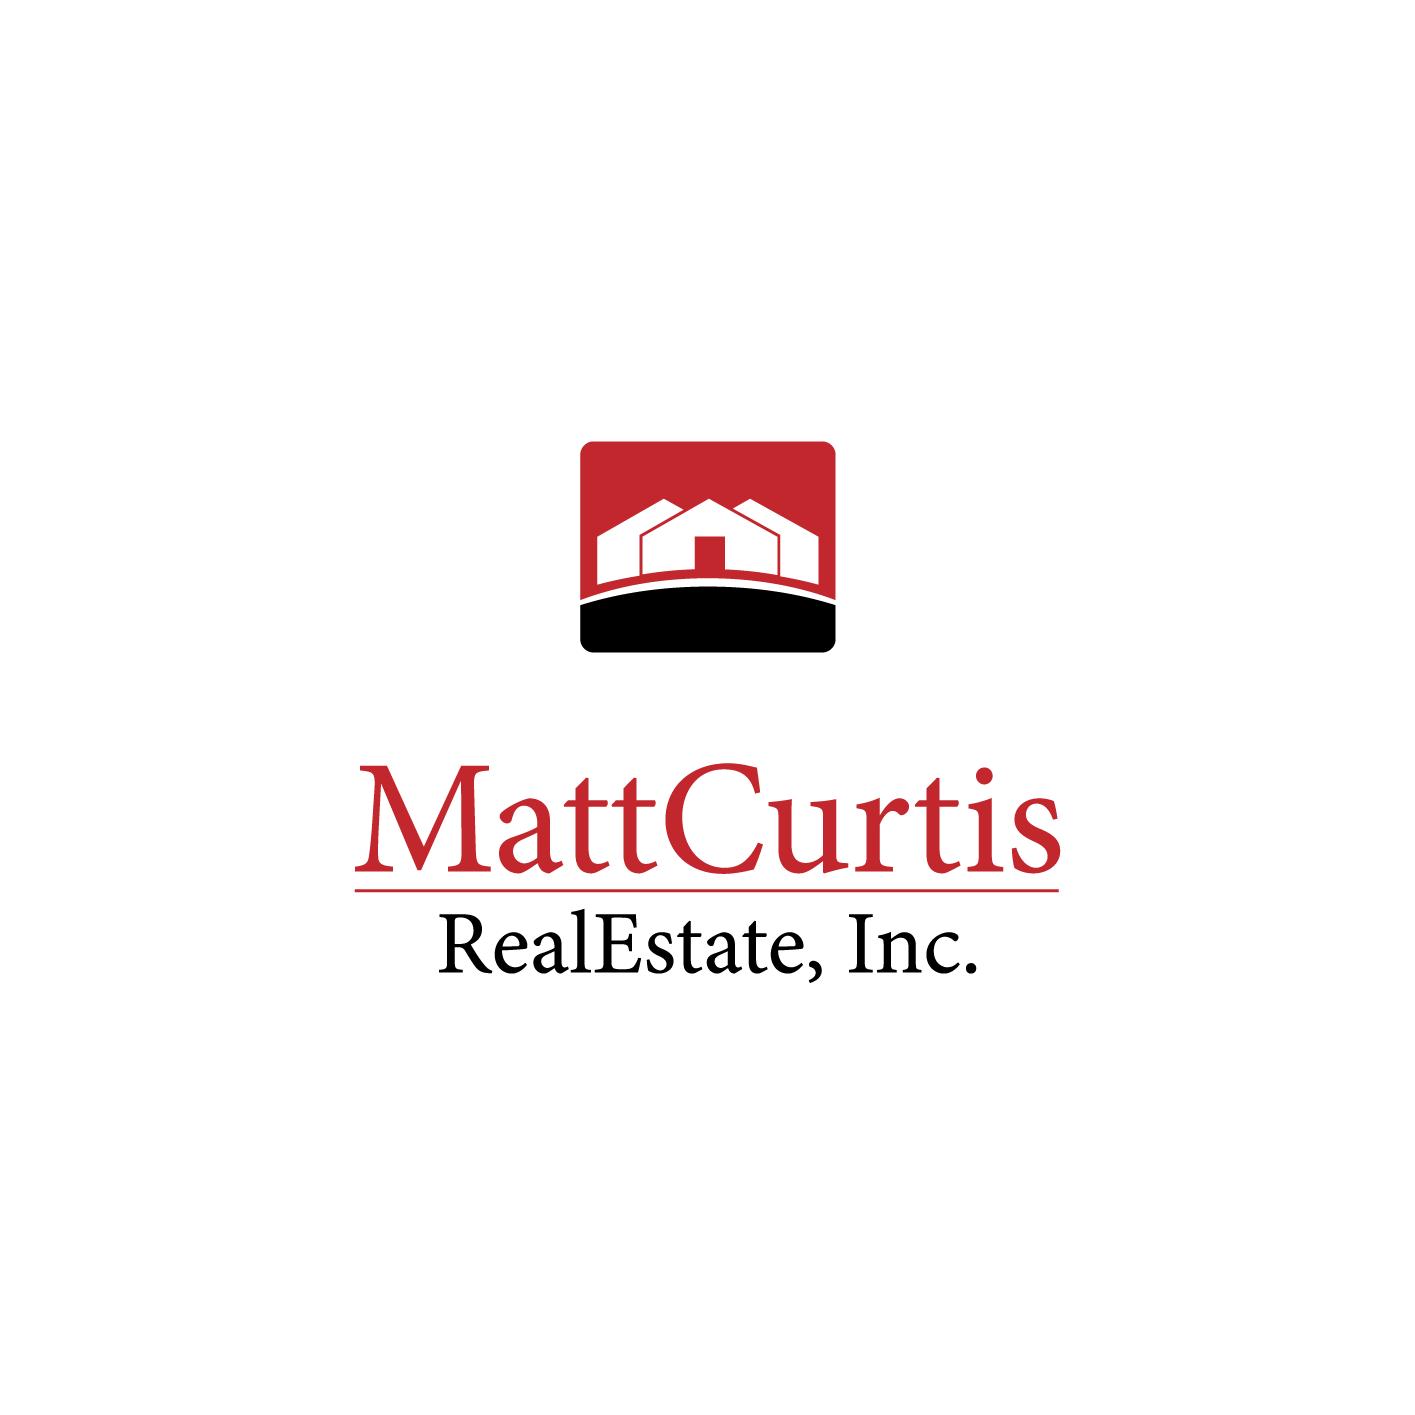 Matt Curtis Real Estate, Inc. - Madison, AL - Real Estate Agents